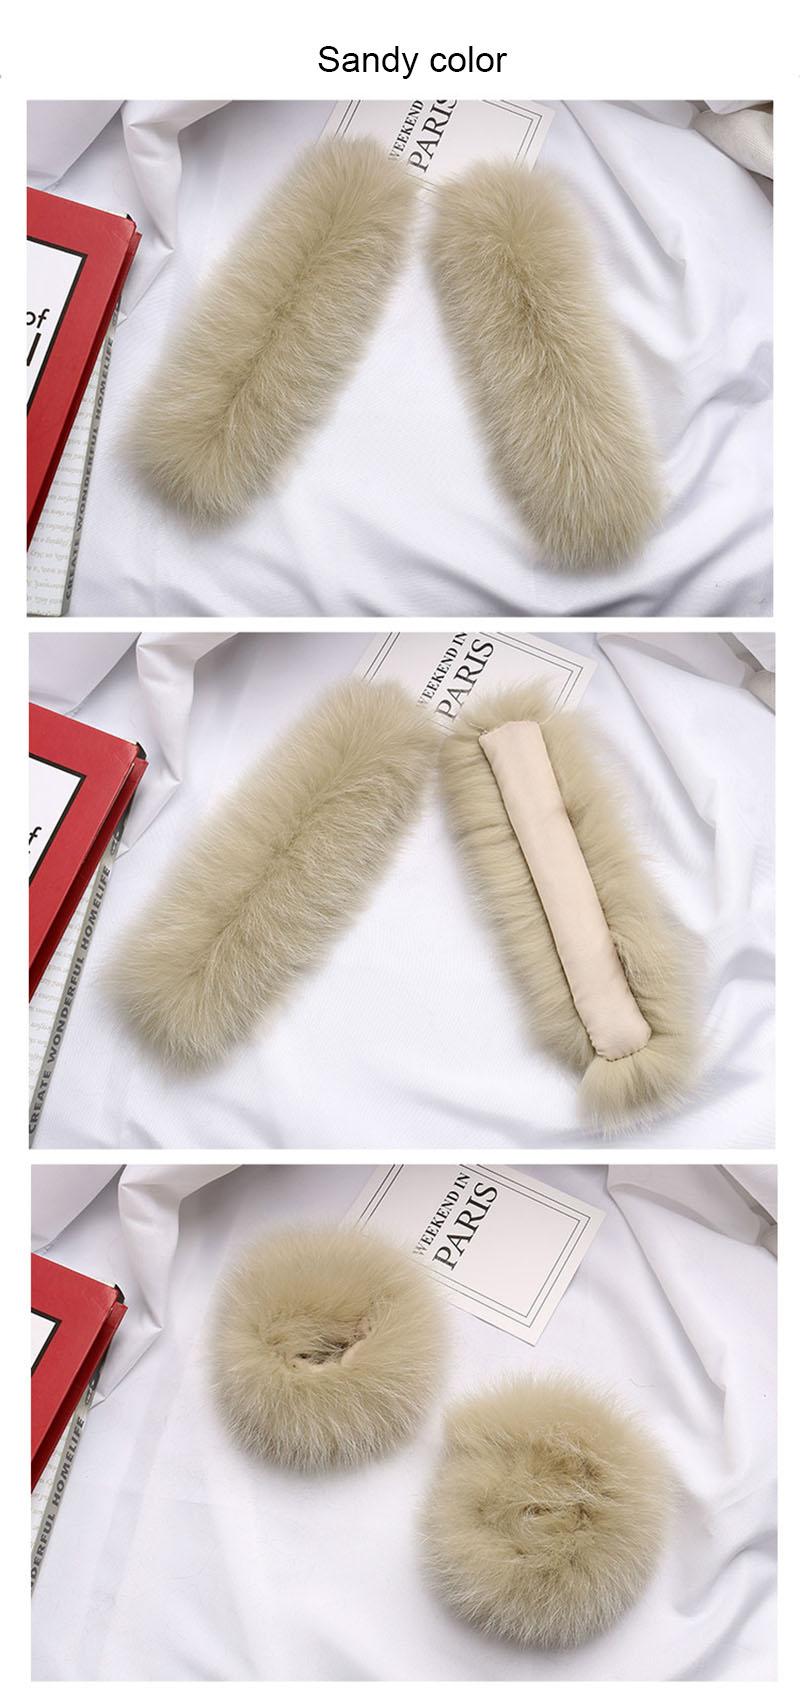 fox fur slap cuffs color sandy